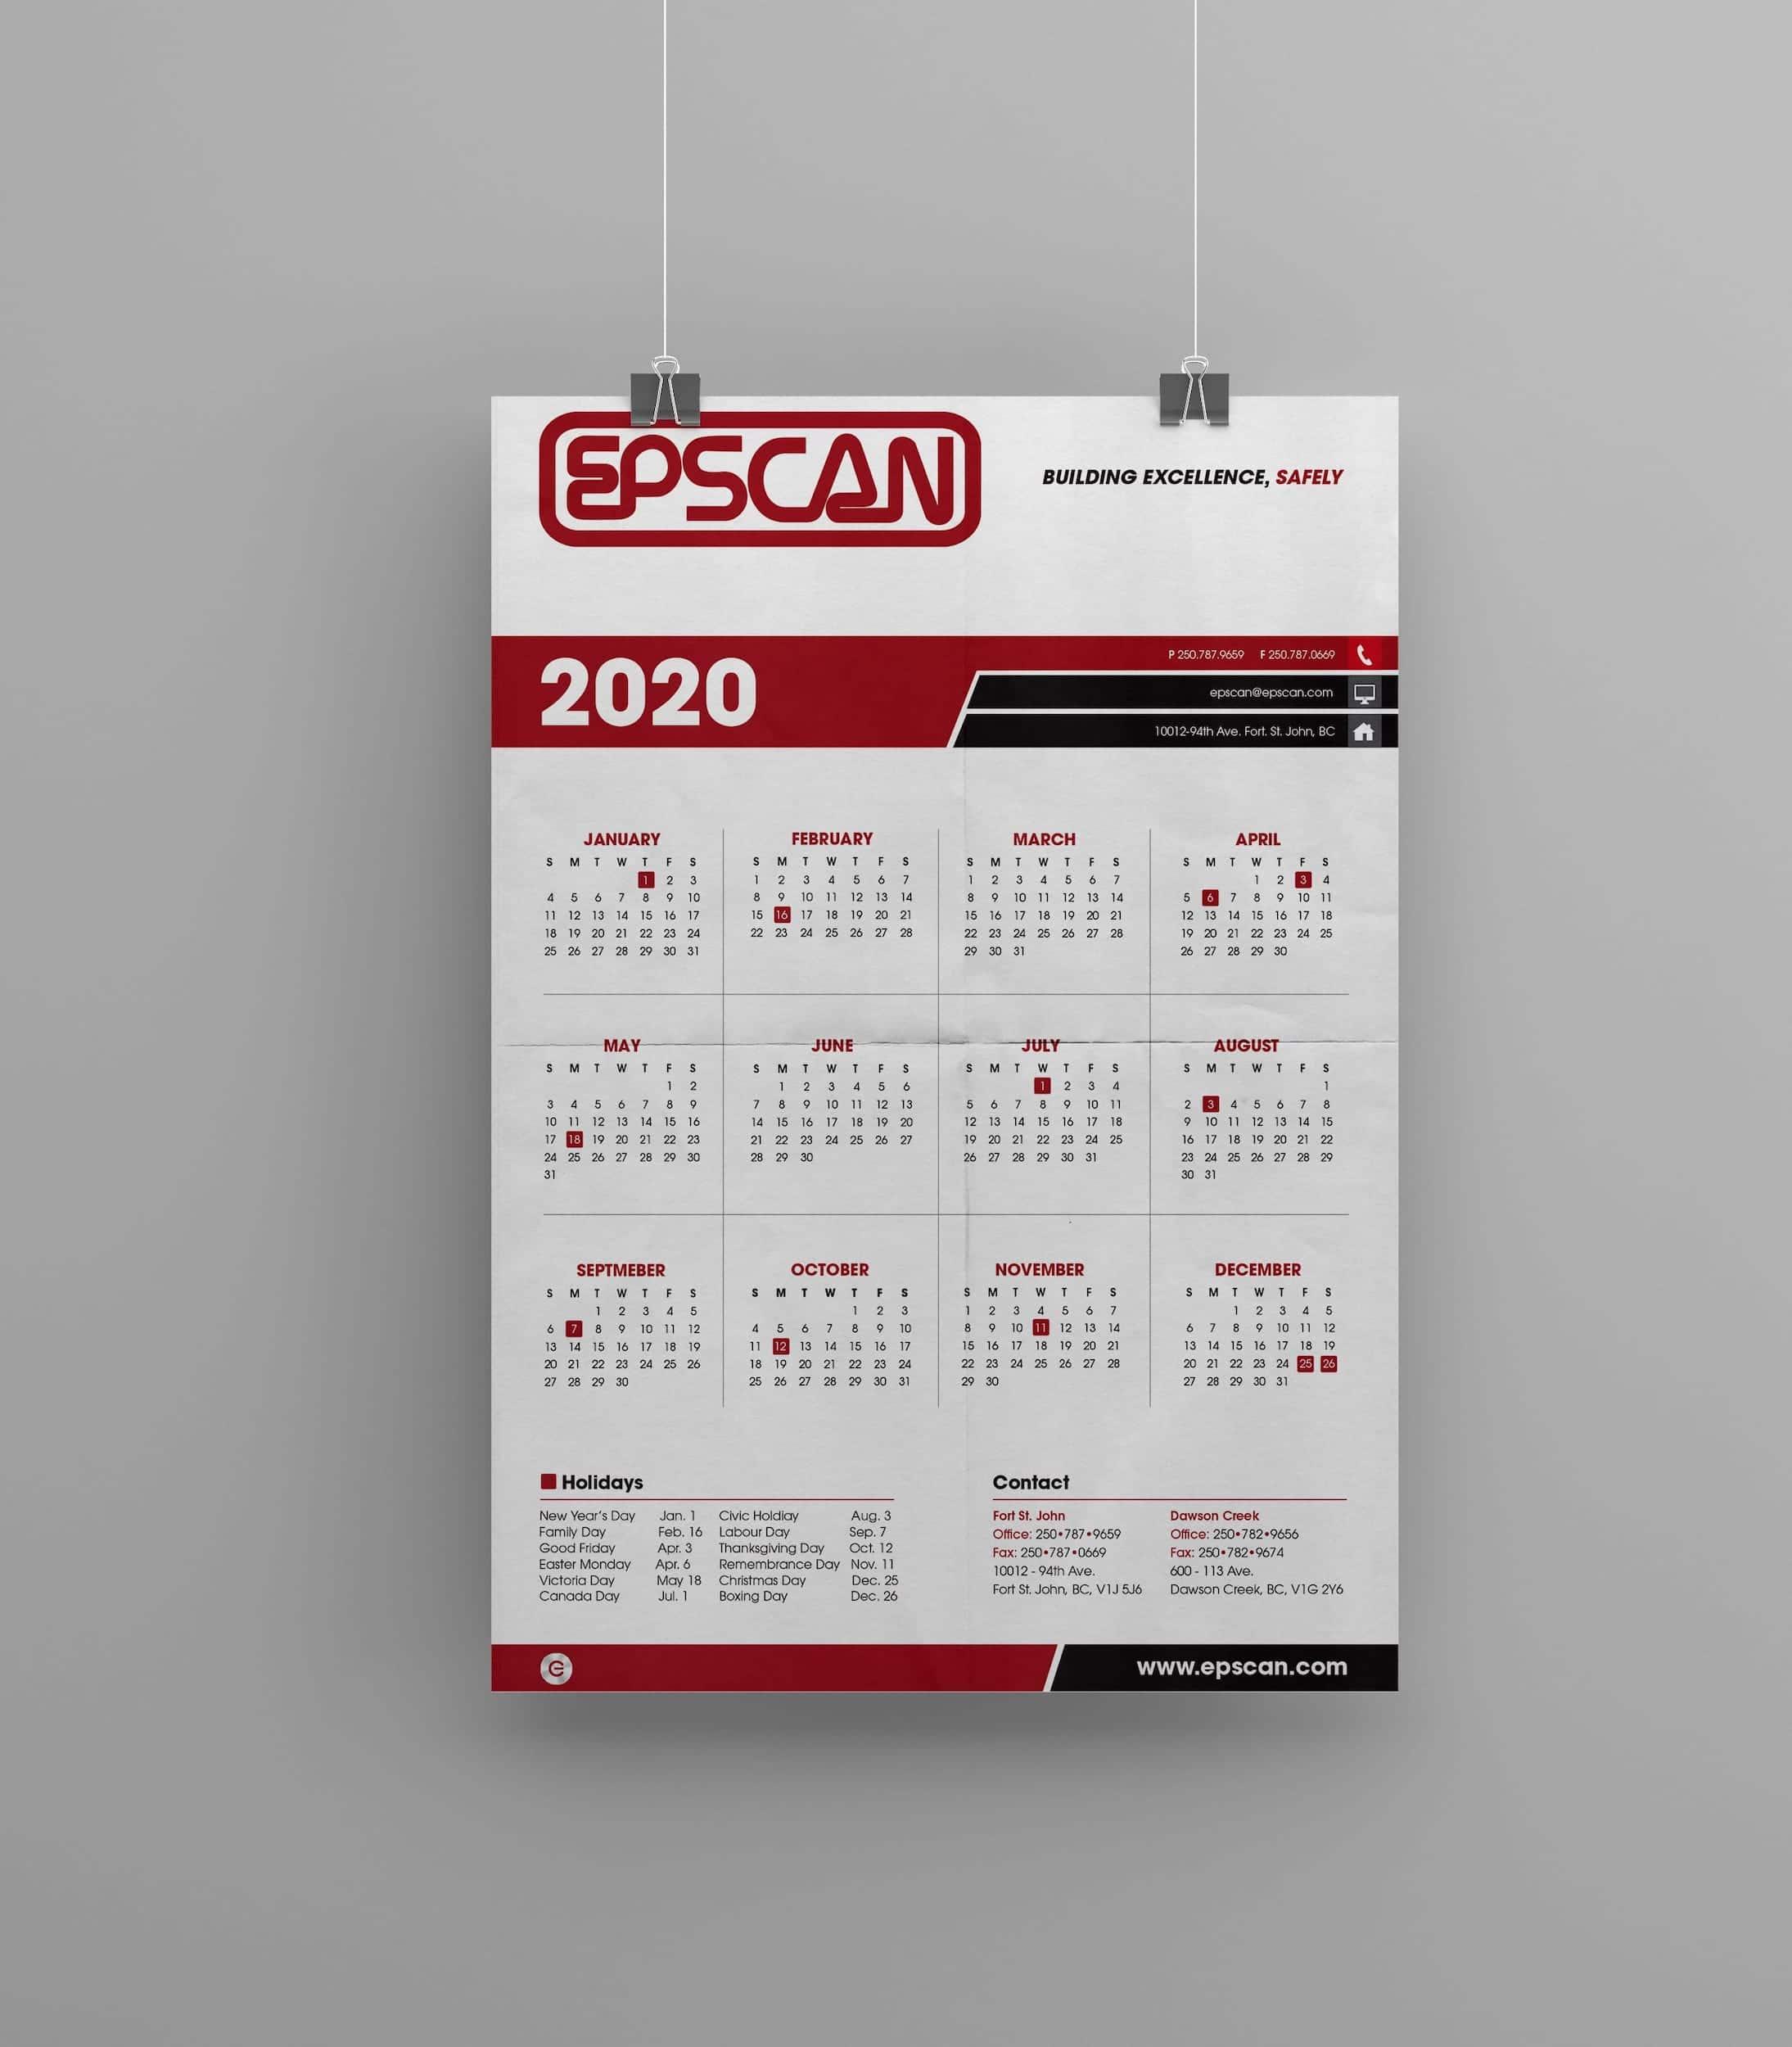 Epscan Industries